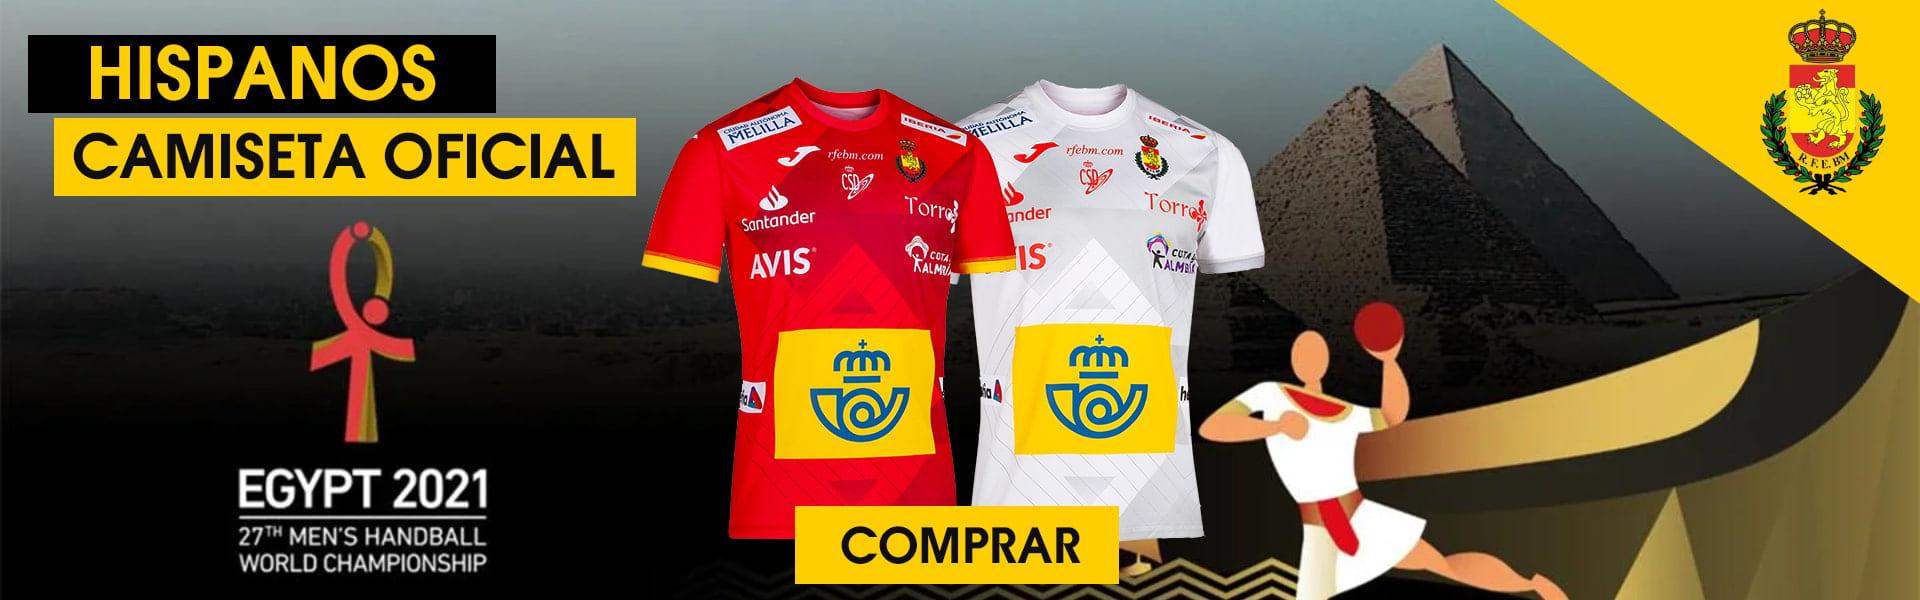 Camiseta Hispanos 2021